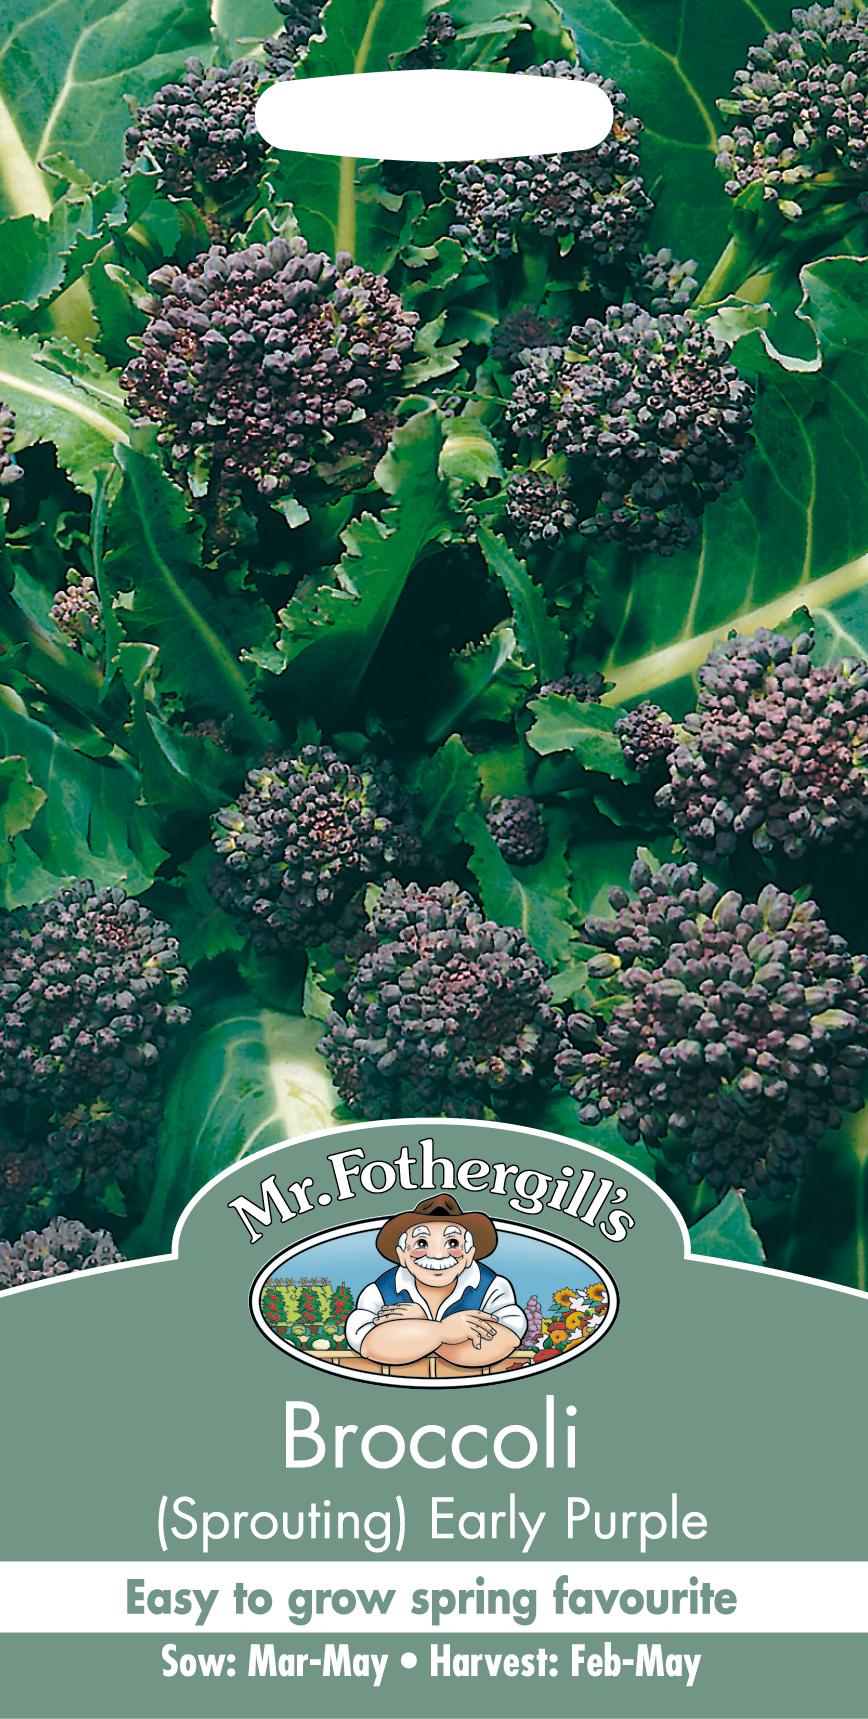 Broccoli 'Early Purple